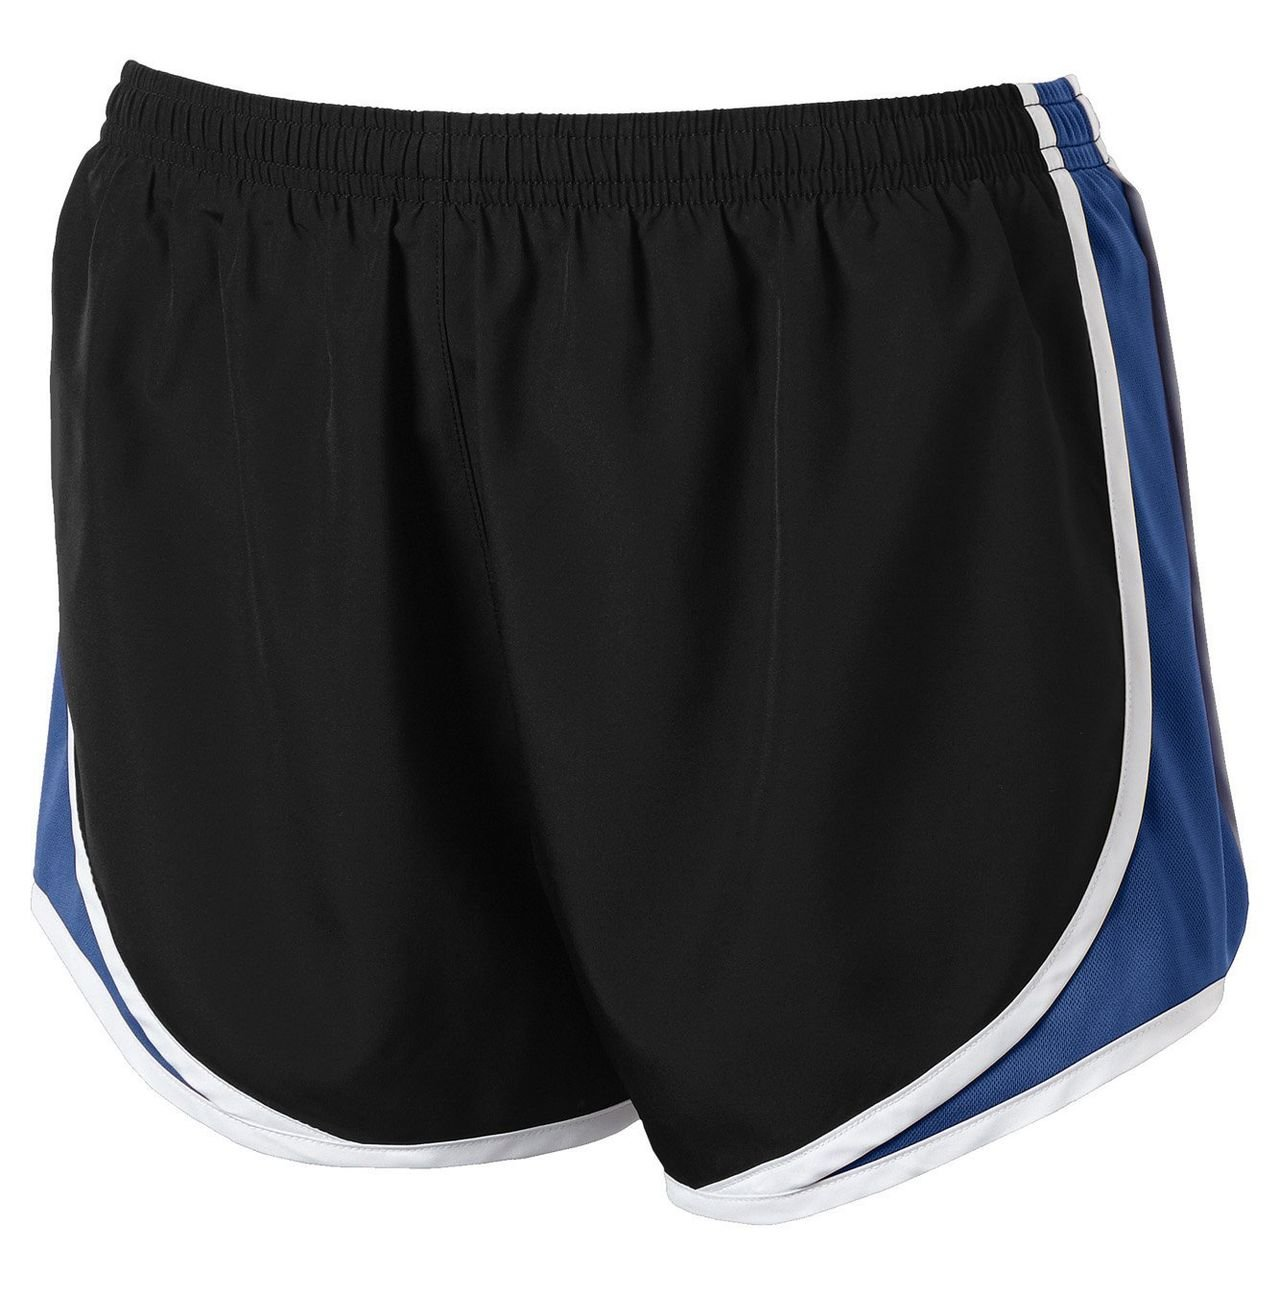 Clothe Co. Ladies Moisture Wicking Sport Running Shorts, Black/True Royal/White, XS